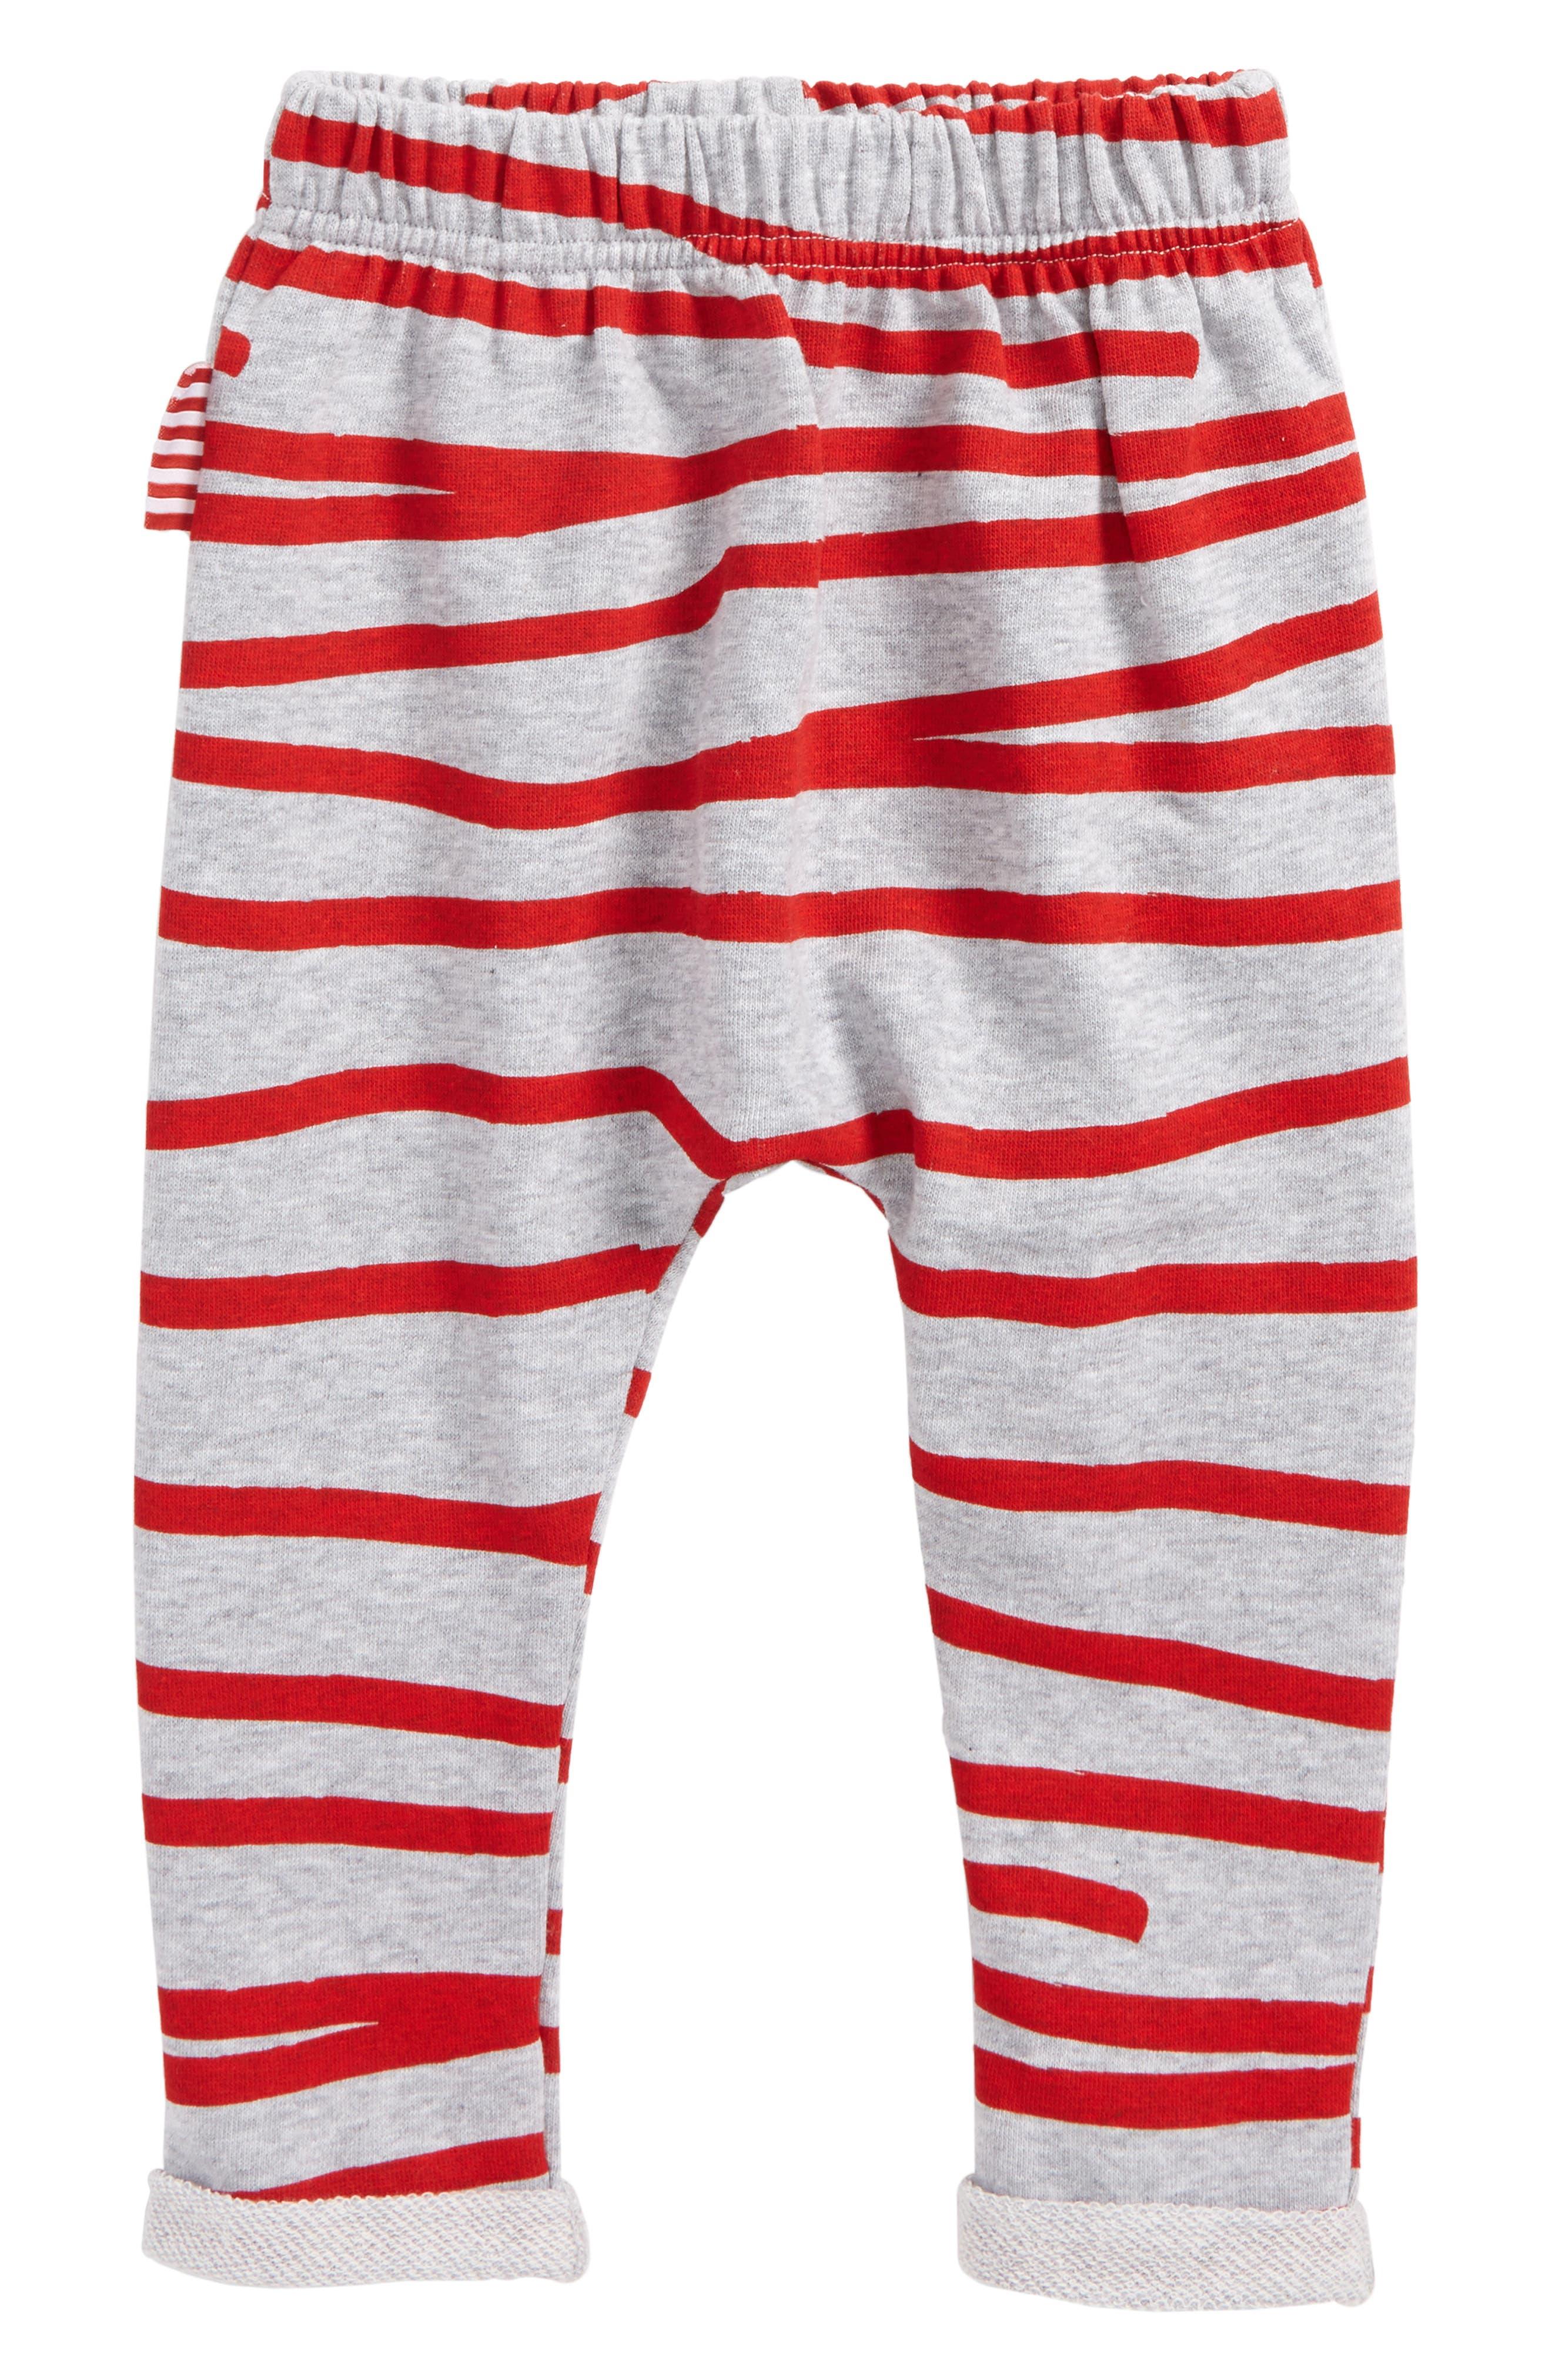 Stripe Jogger Pants,                         Main,                         color, Greymarle/ Red